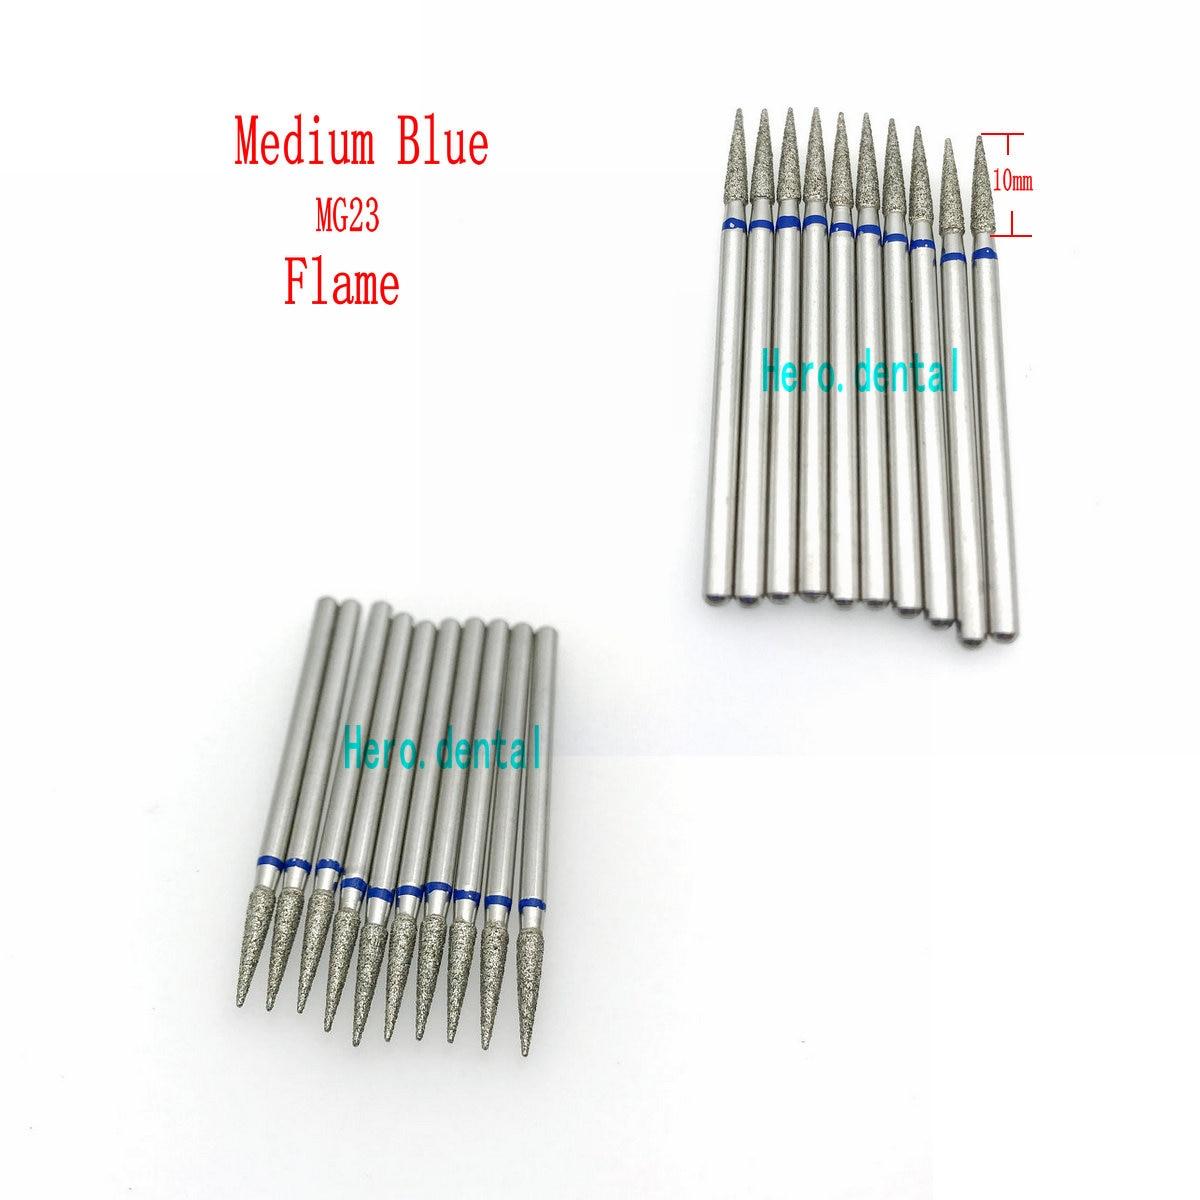 10pcs 2.35mm Dental Shank Diamond Grinding Bur Drill Bits For Dental Grinding Flame/Taper/Pearl Shape Dental Polishing Burs